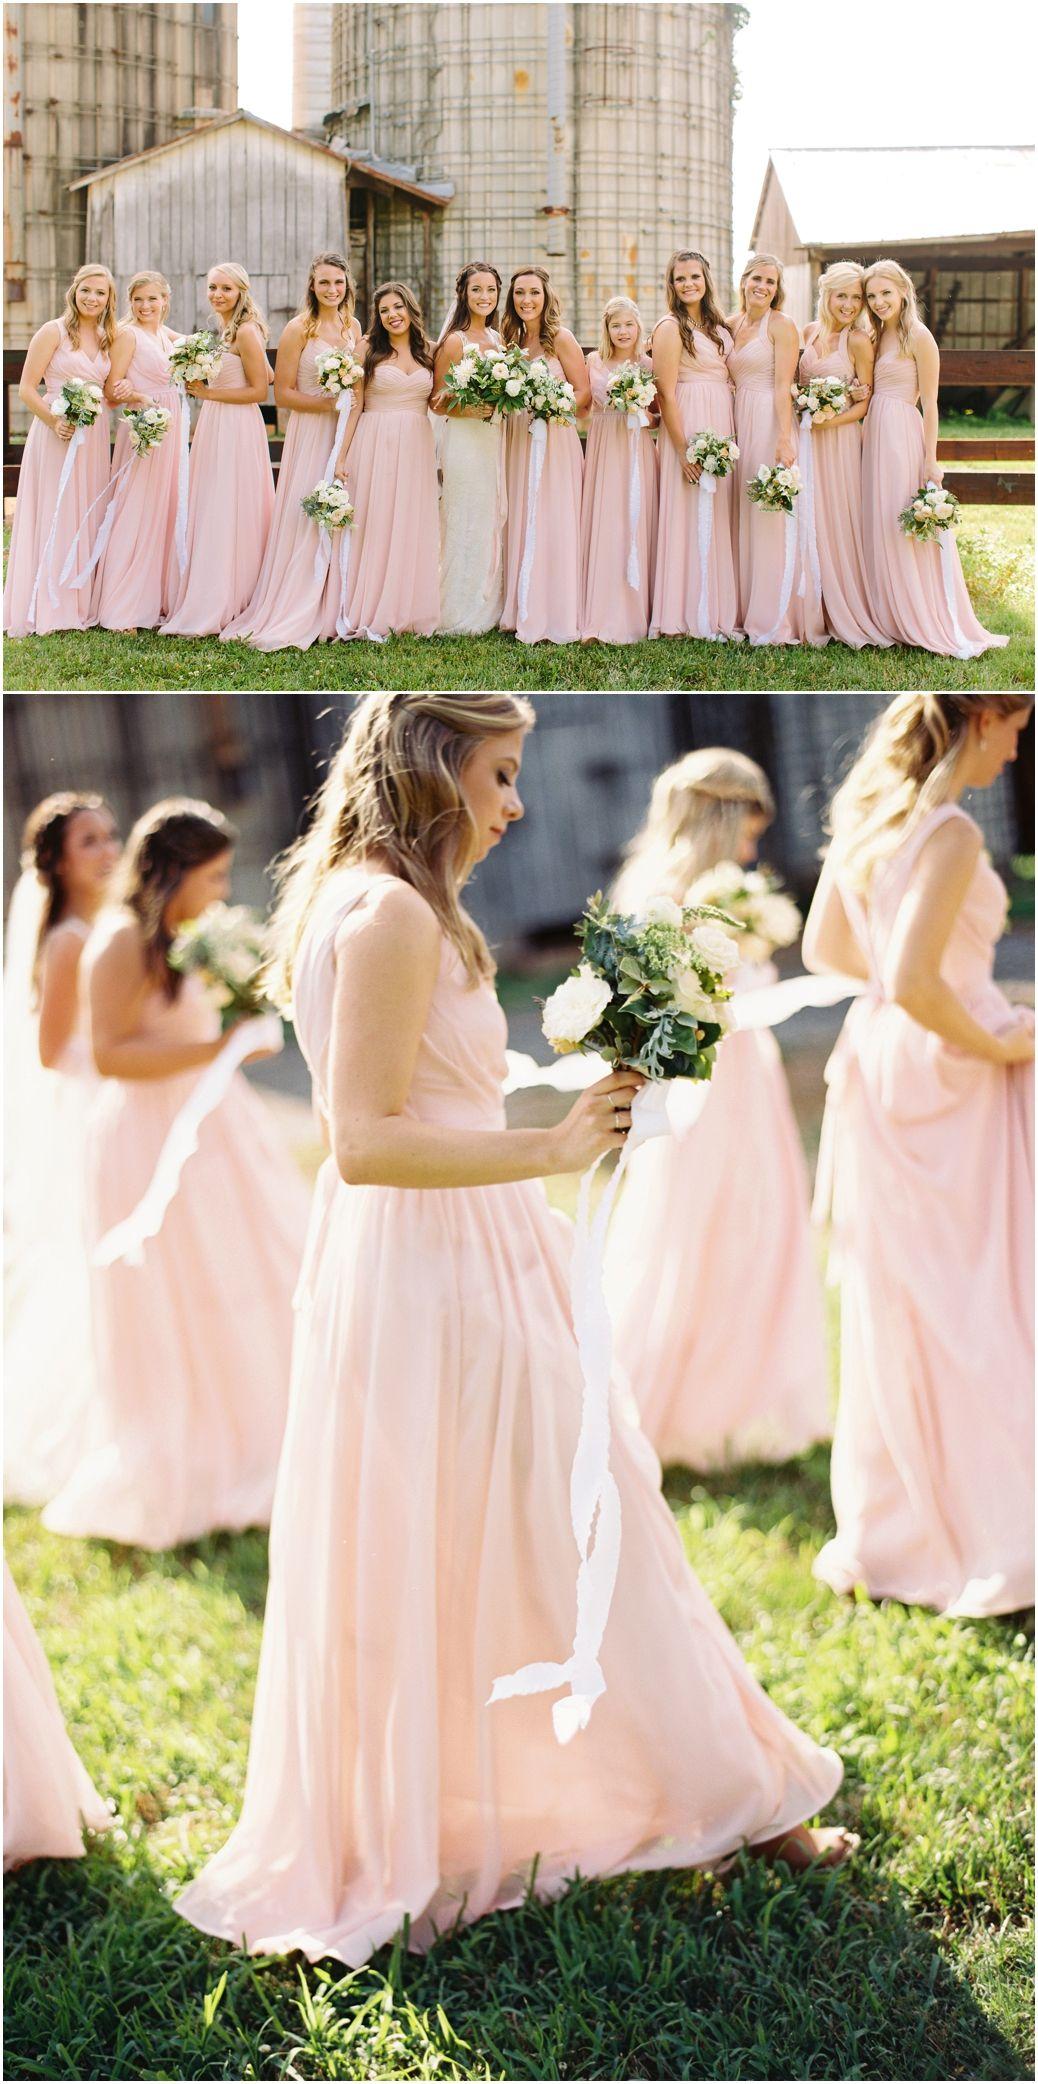 Bridesmaids For A Barn Wedding At The Grove Williamson Place In Murfreesboro Tn